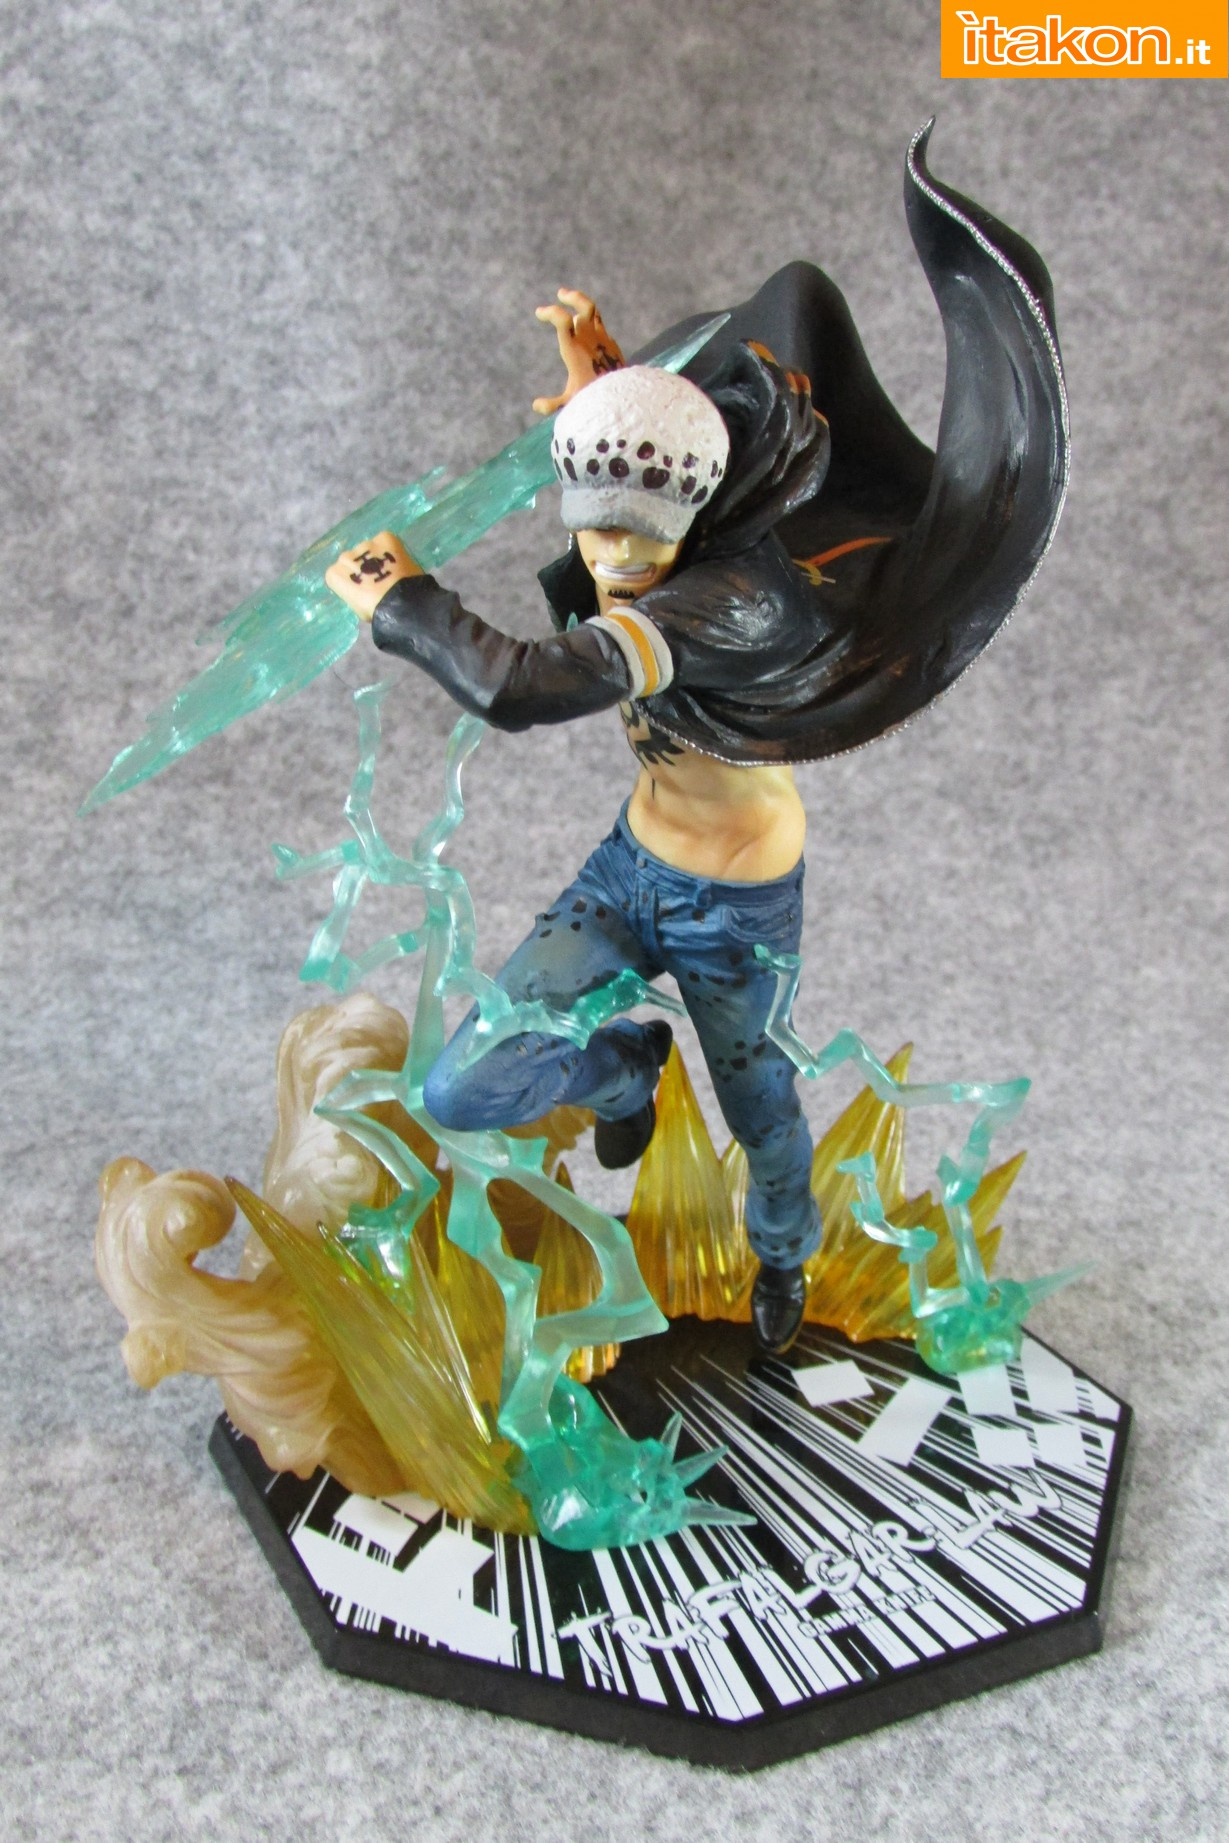 Link a One Piece Trafalgar Law Gamma Knife Figuarts ZERO Chou Gekisen Extra Battle Recensione Review Itakon.it 26